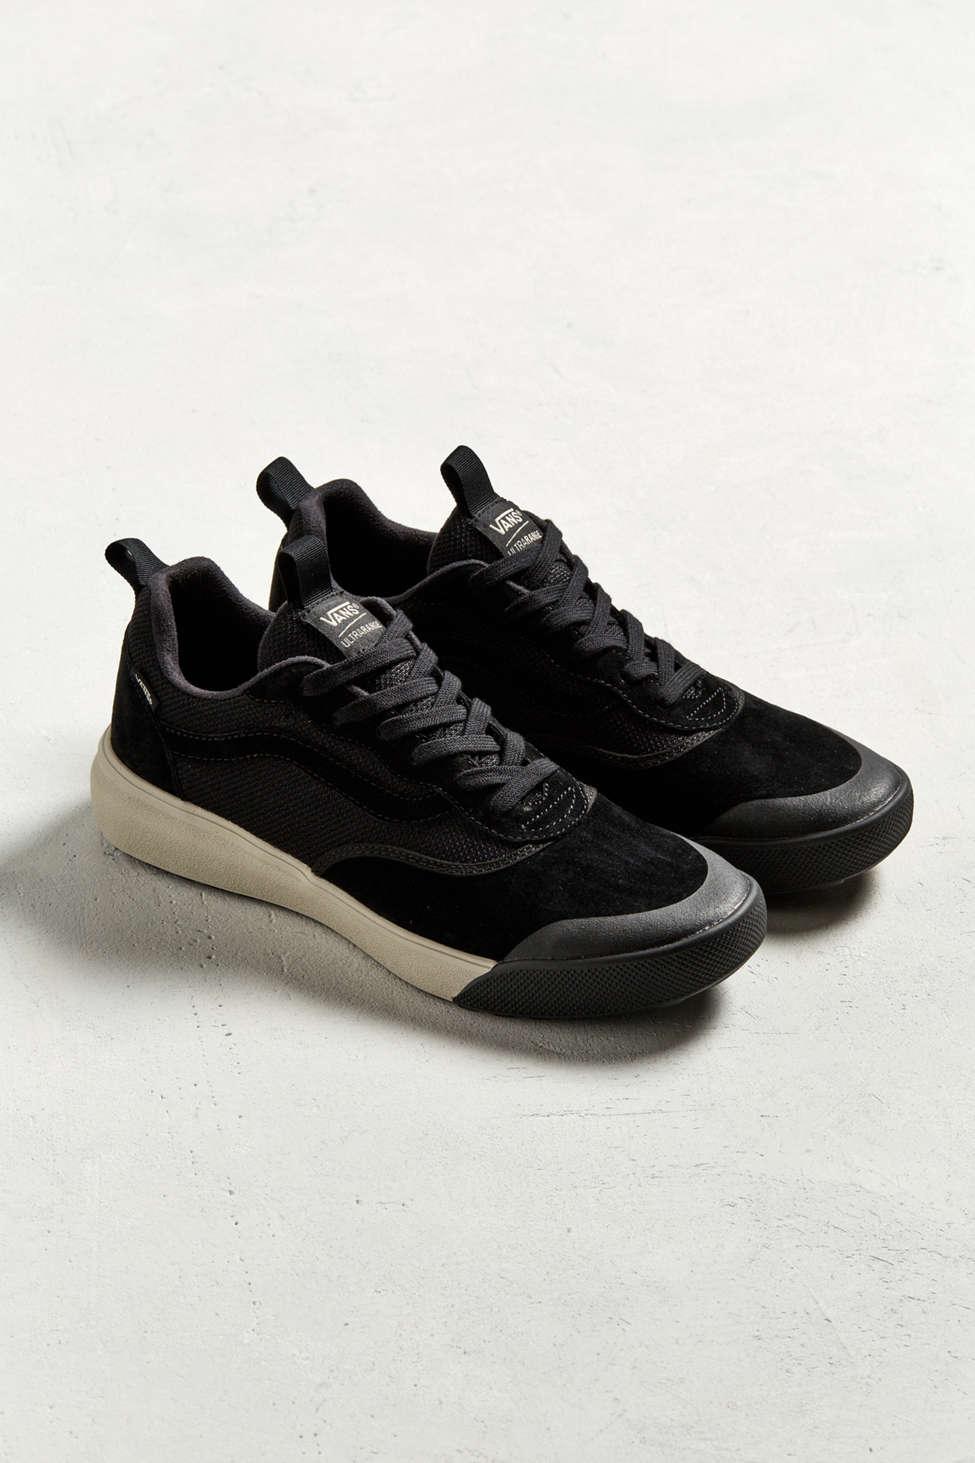 vans mte ultra range sneaker | urban outfitters